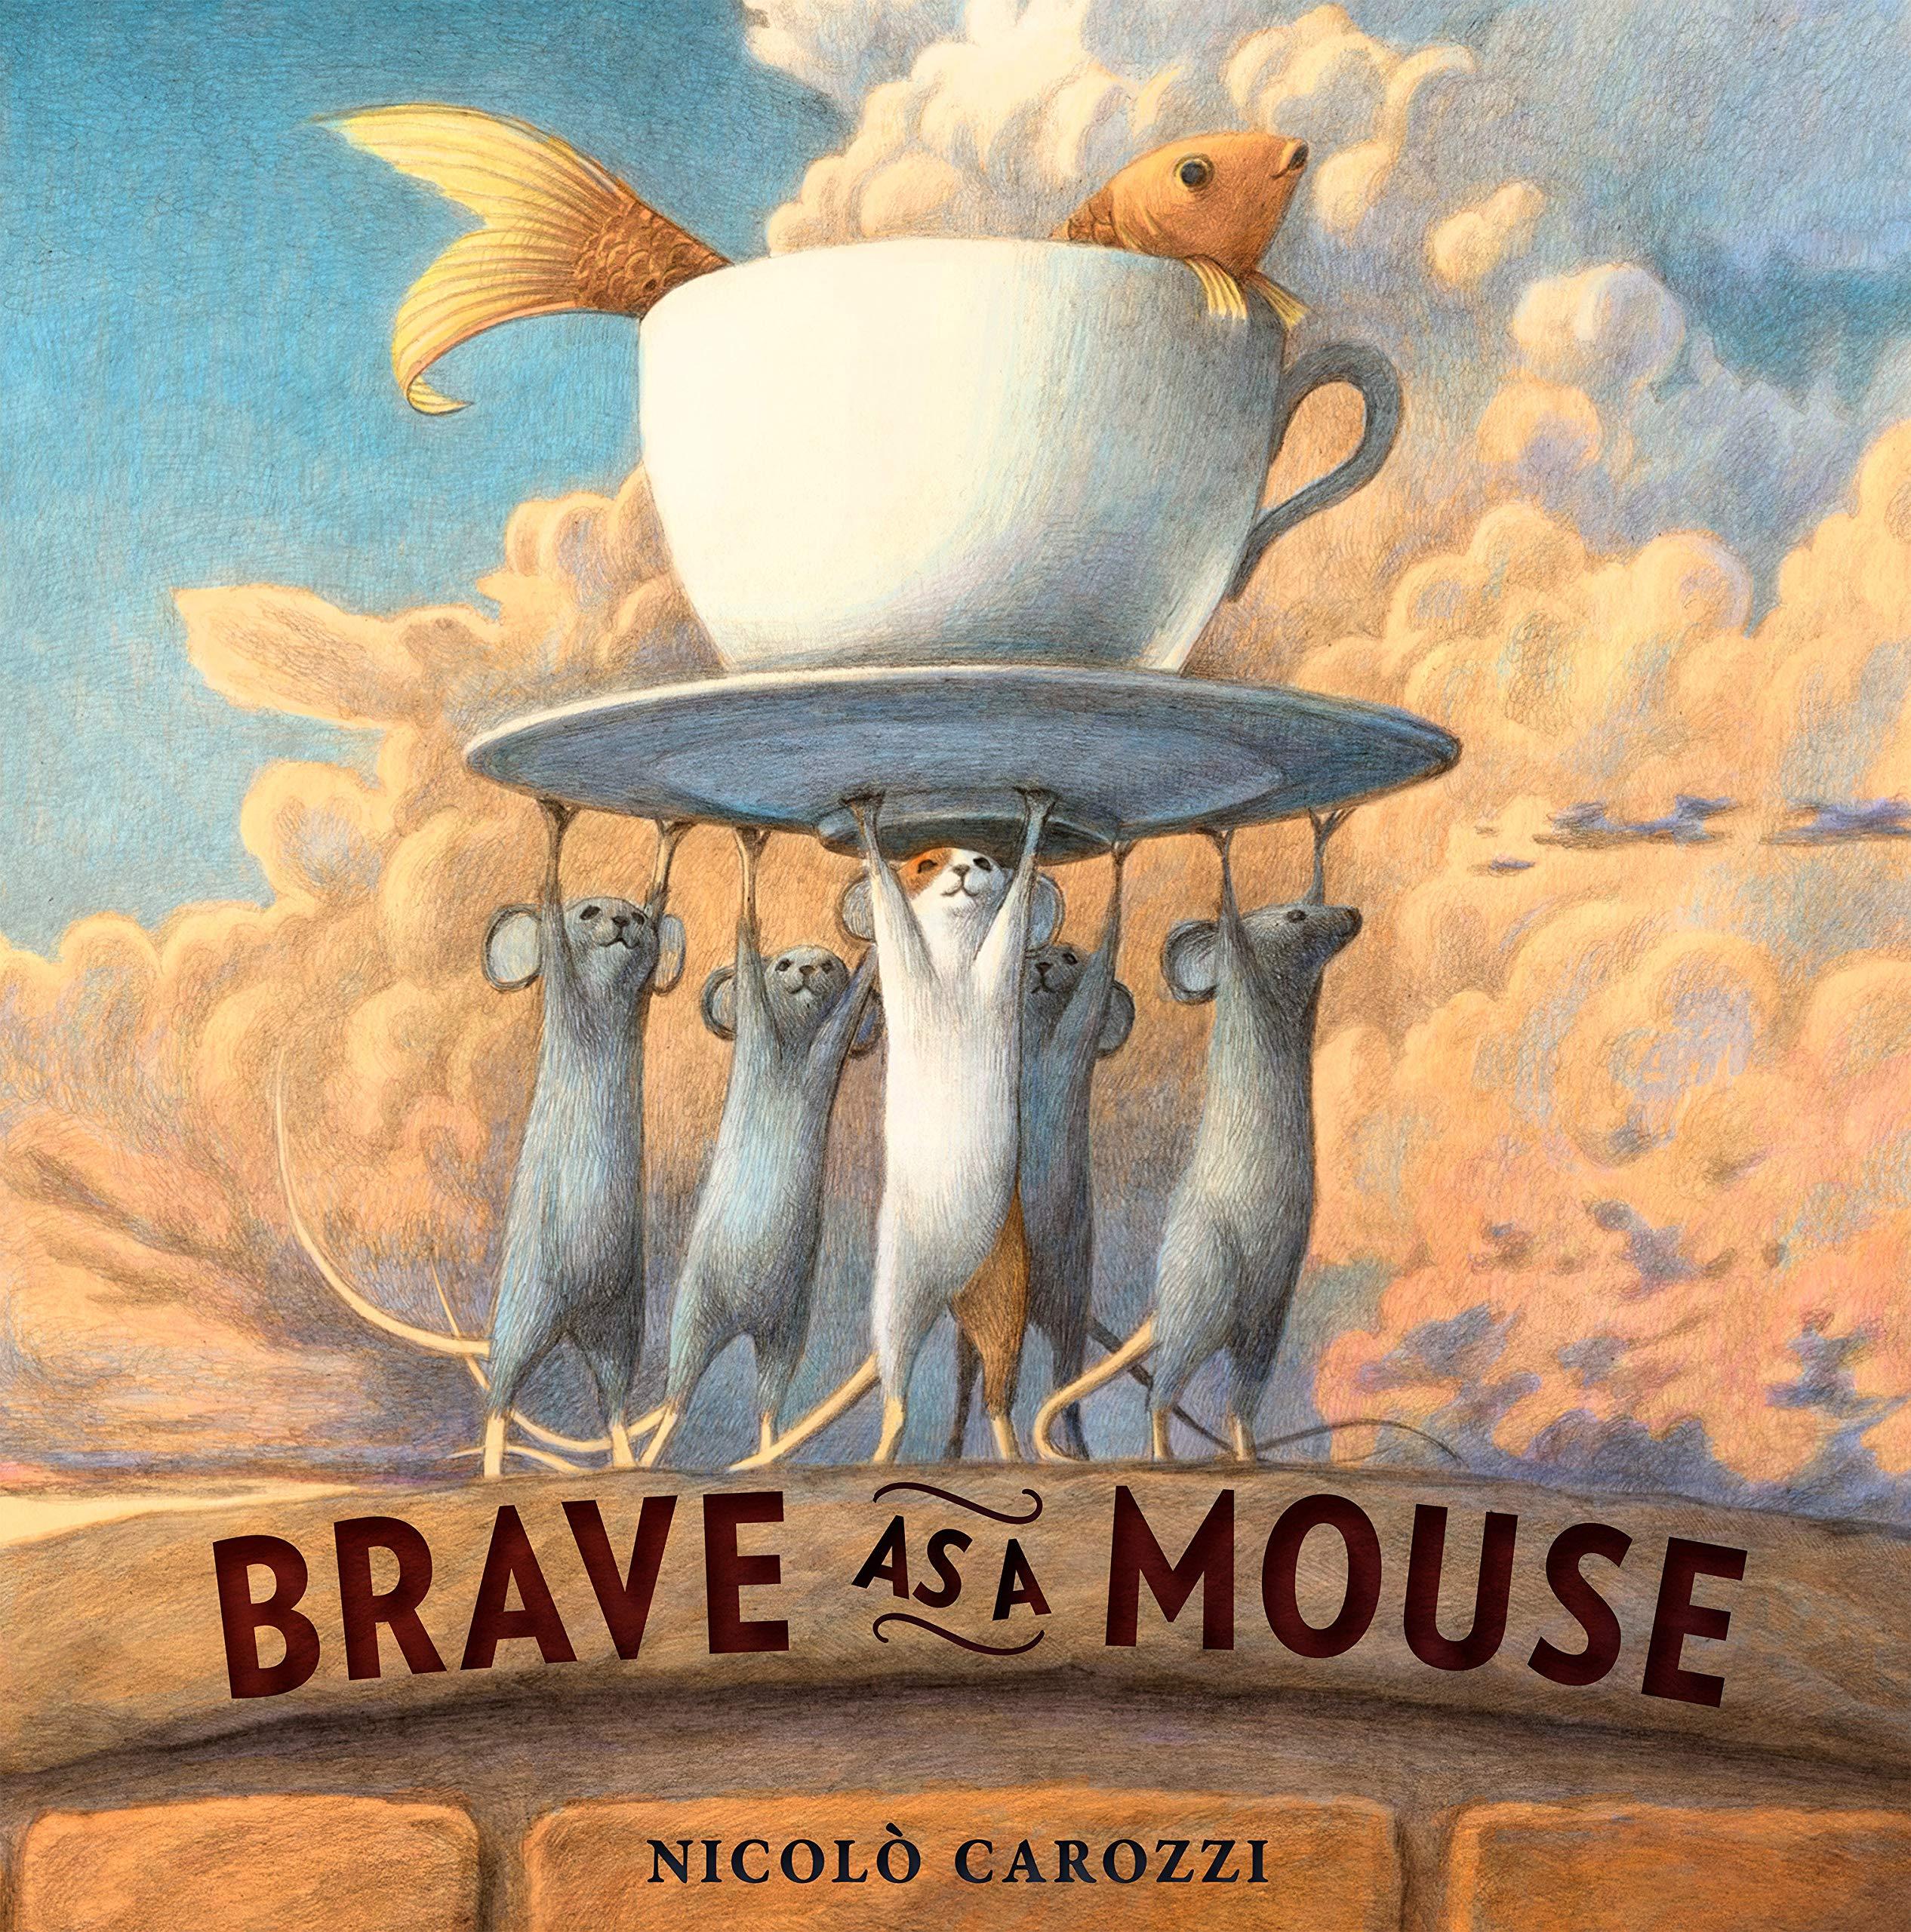 Brave as a Mouse: Carozzi, Nicolo: 9780593181843: Amazon.com: Books